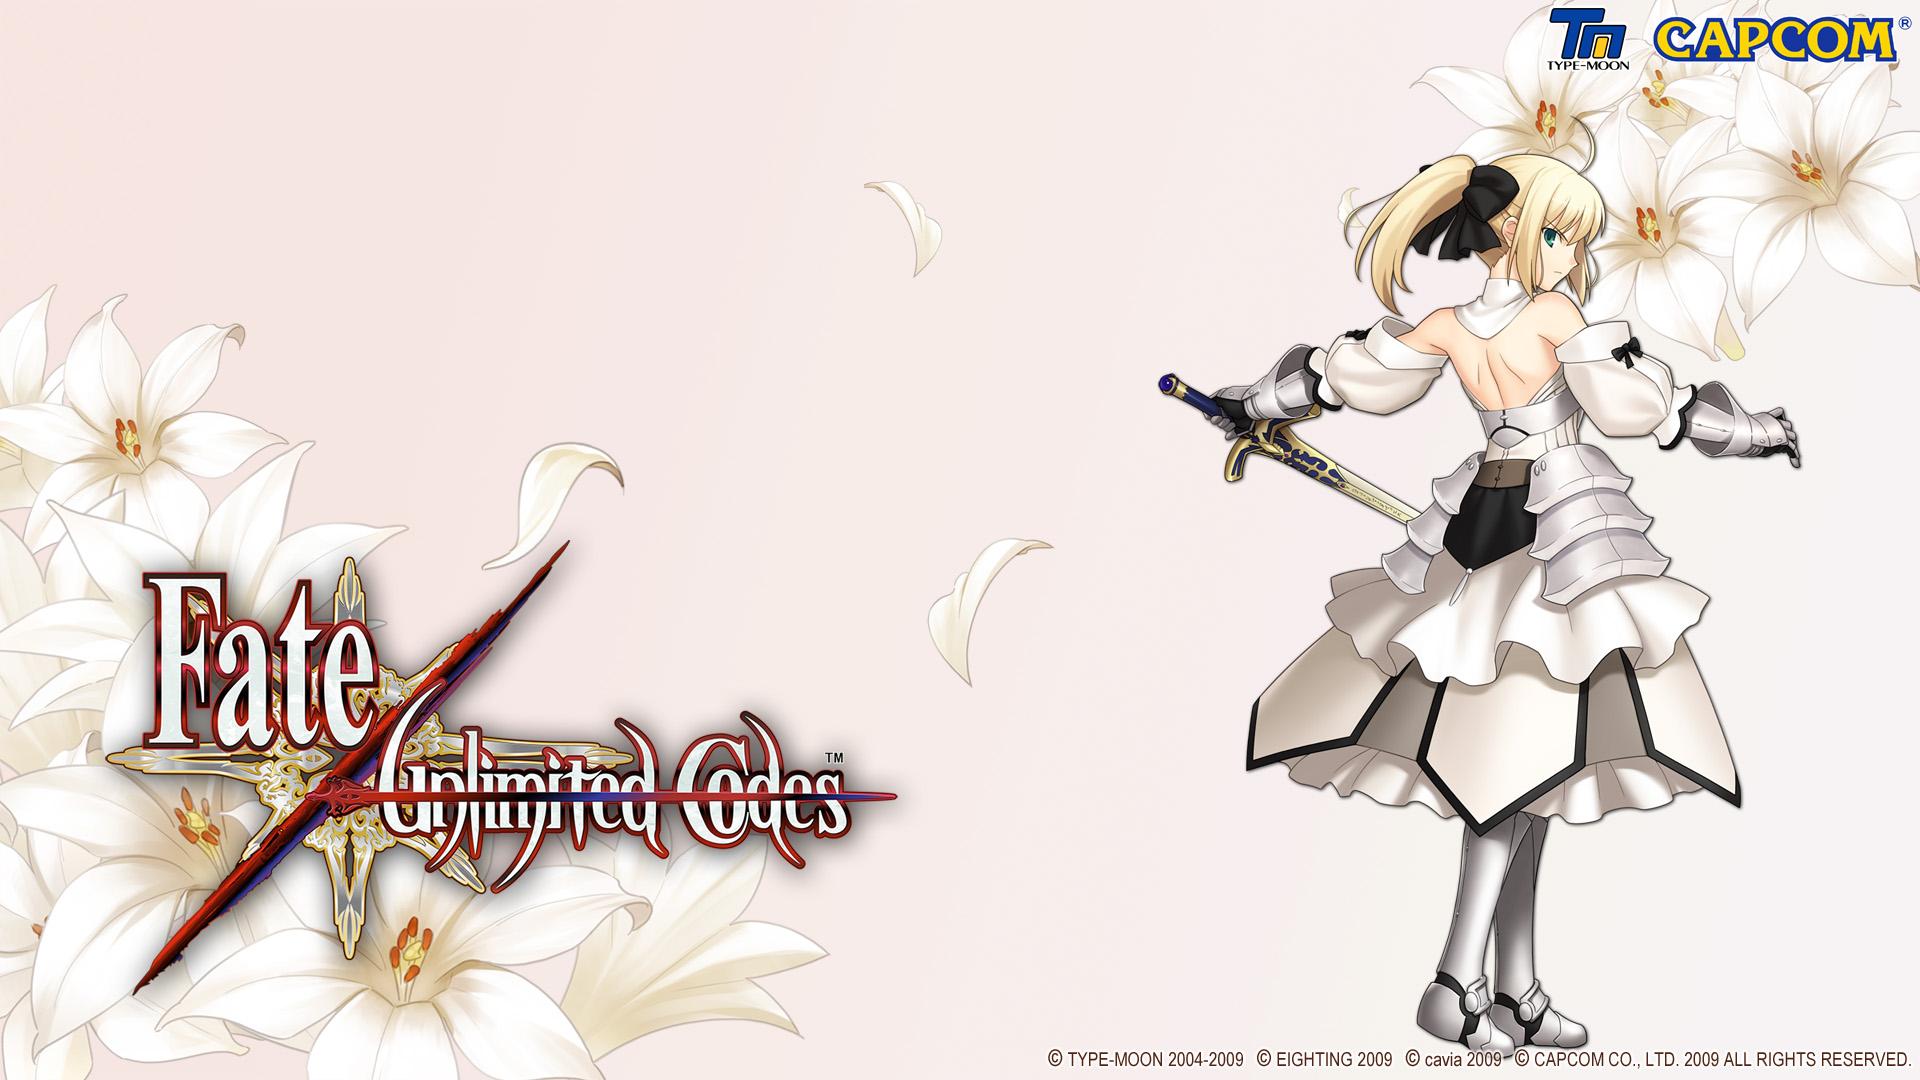 PS3 PSN - Full Direct Links - Games, Add-ons, Demos, etc  - Pastebin com